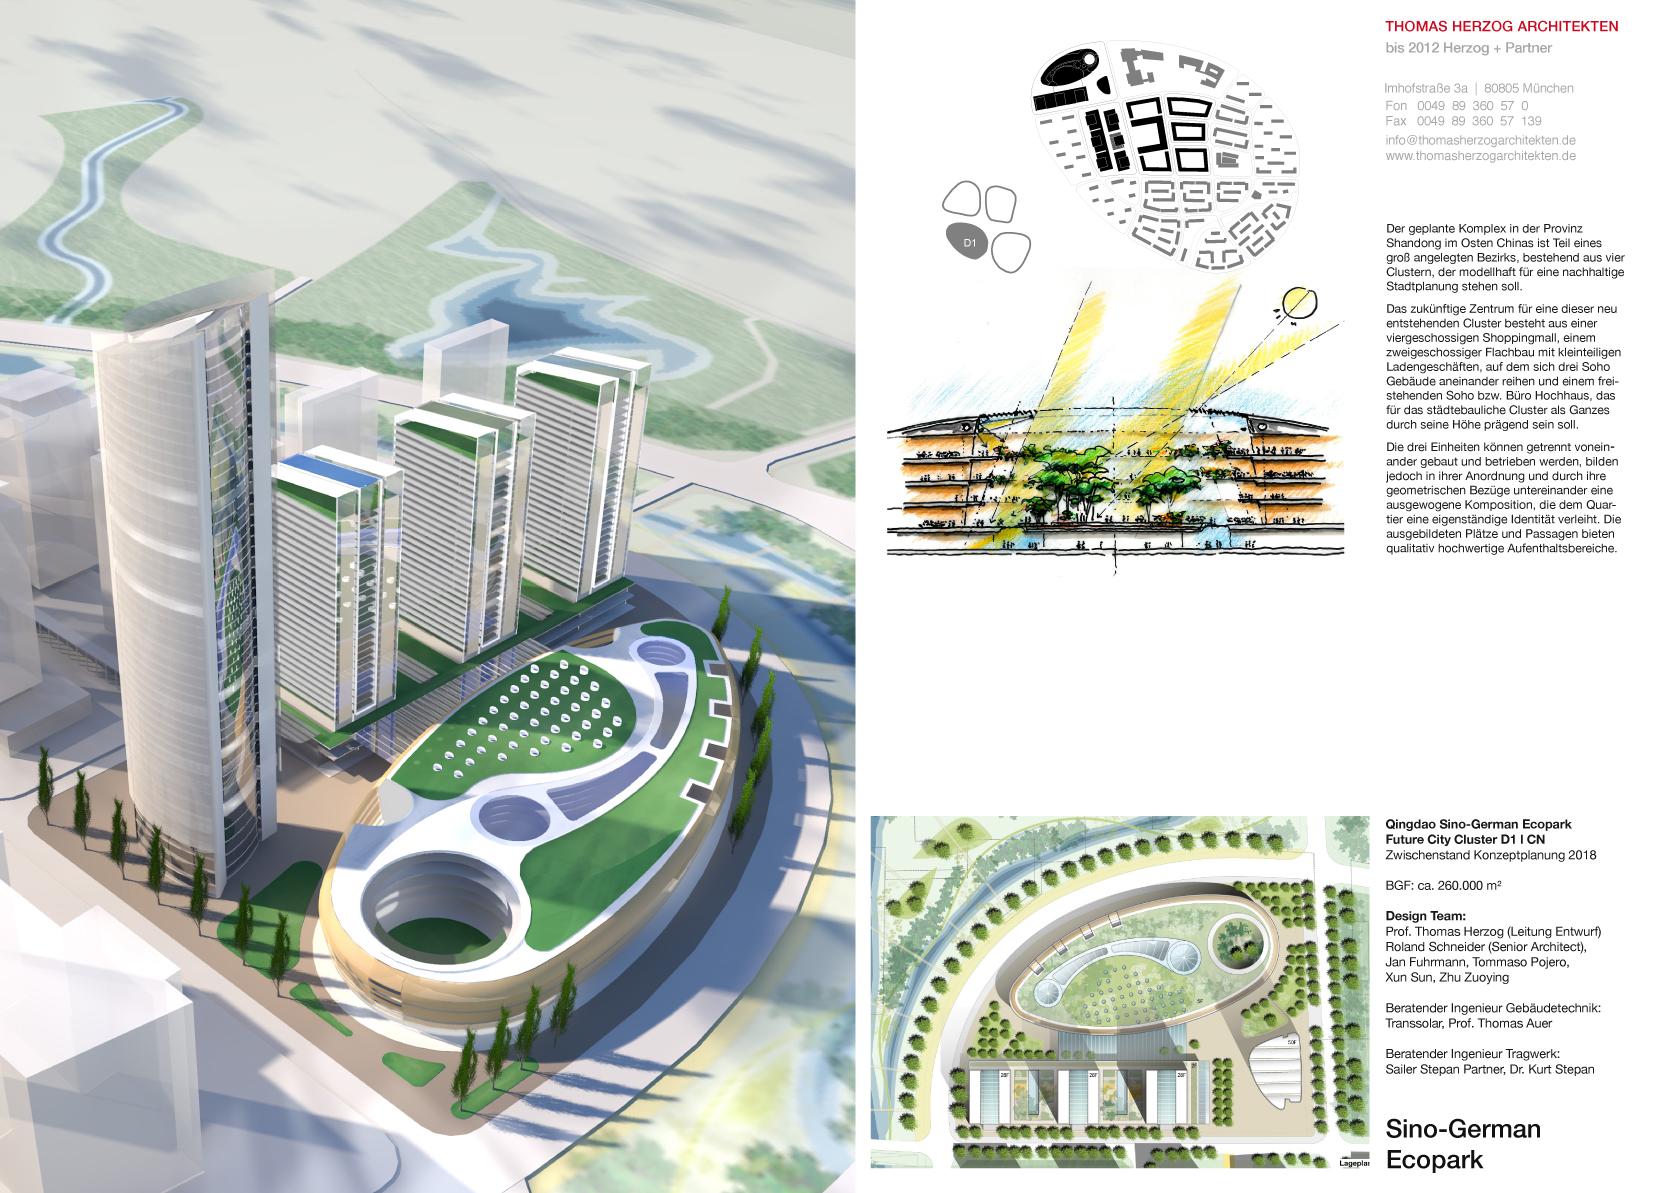 Sino-German Ecopark CN 2019